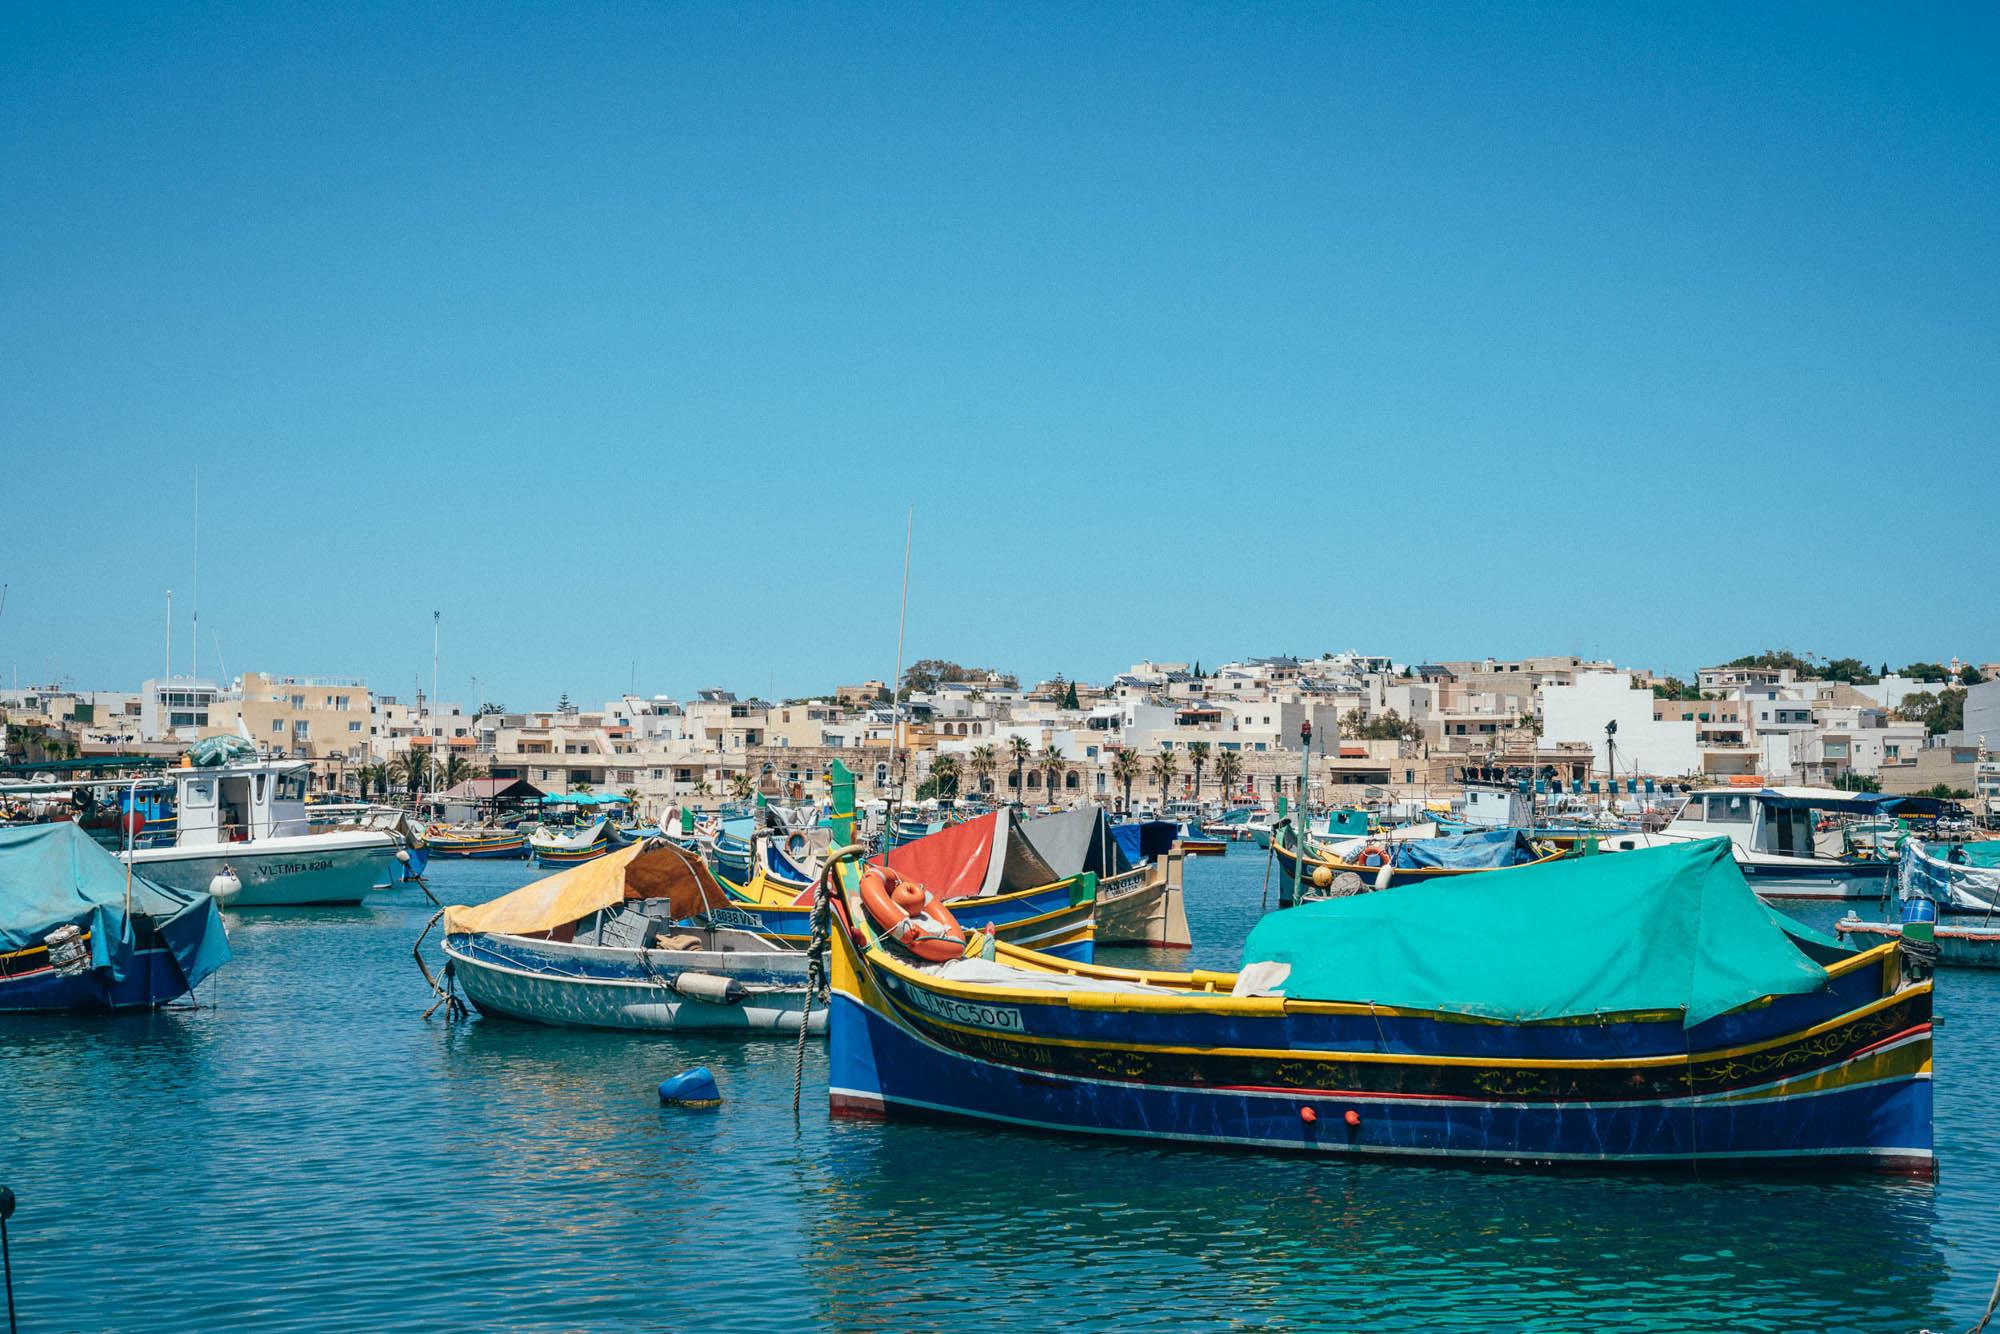 Marsaxlokk is a small traditional fishing village in Republic of Malta.